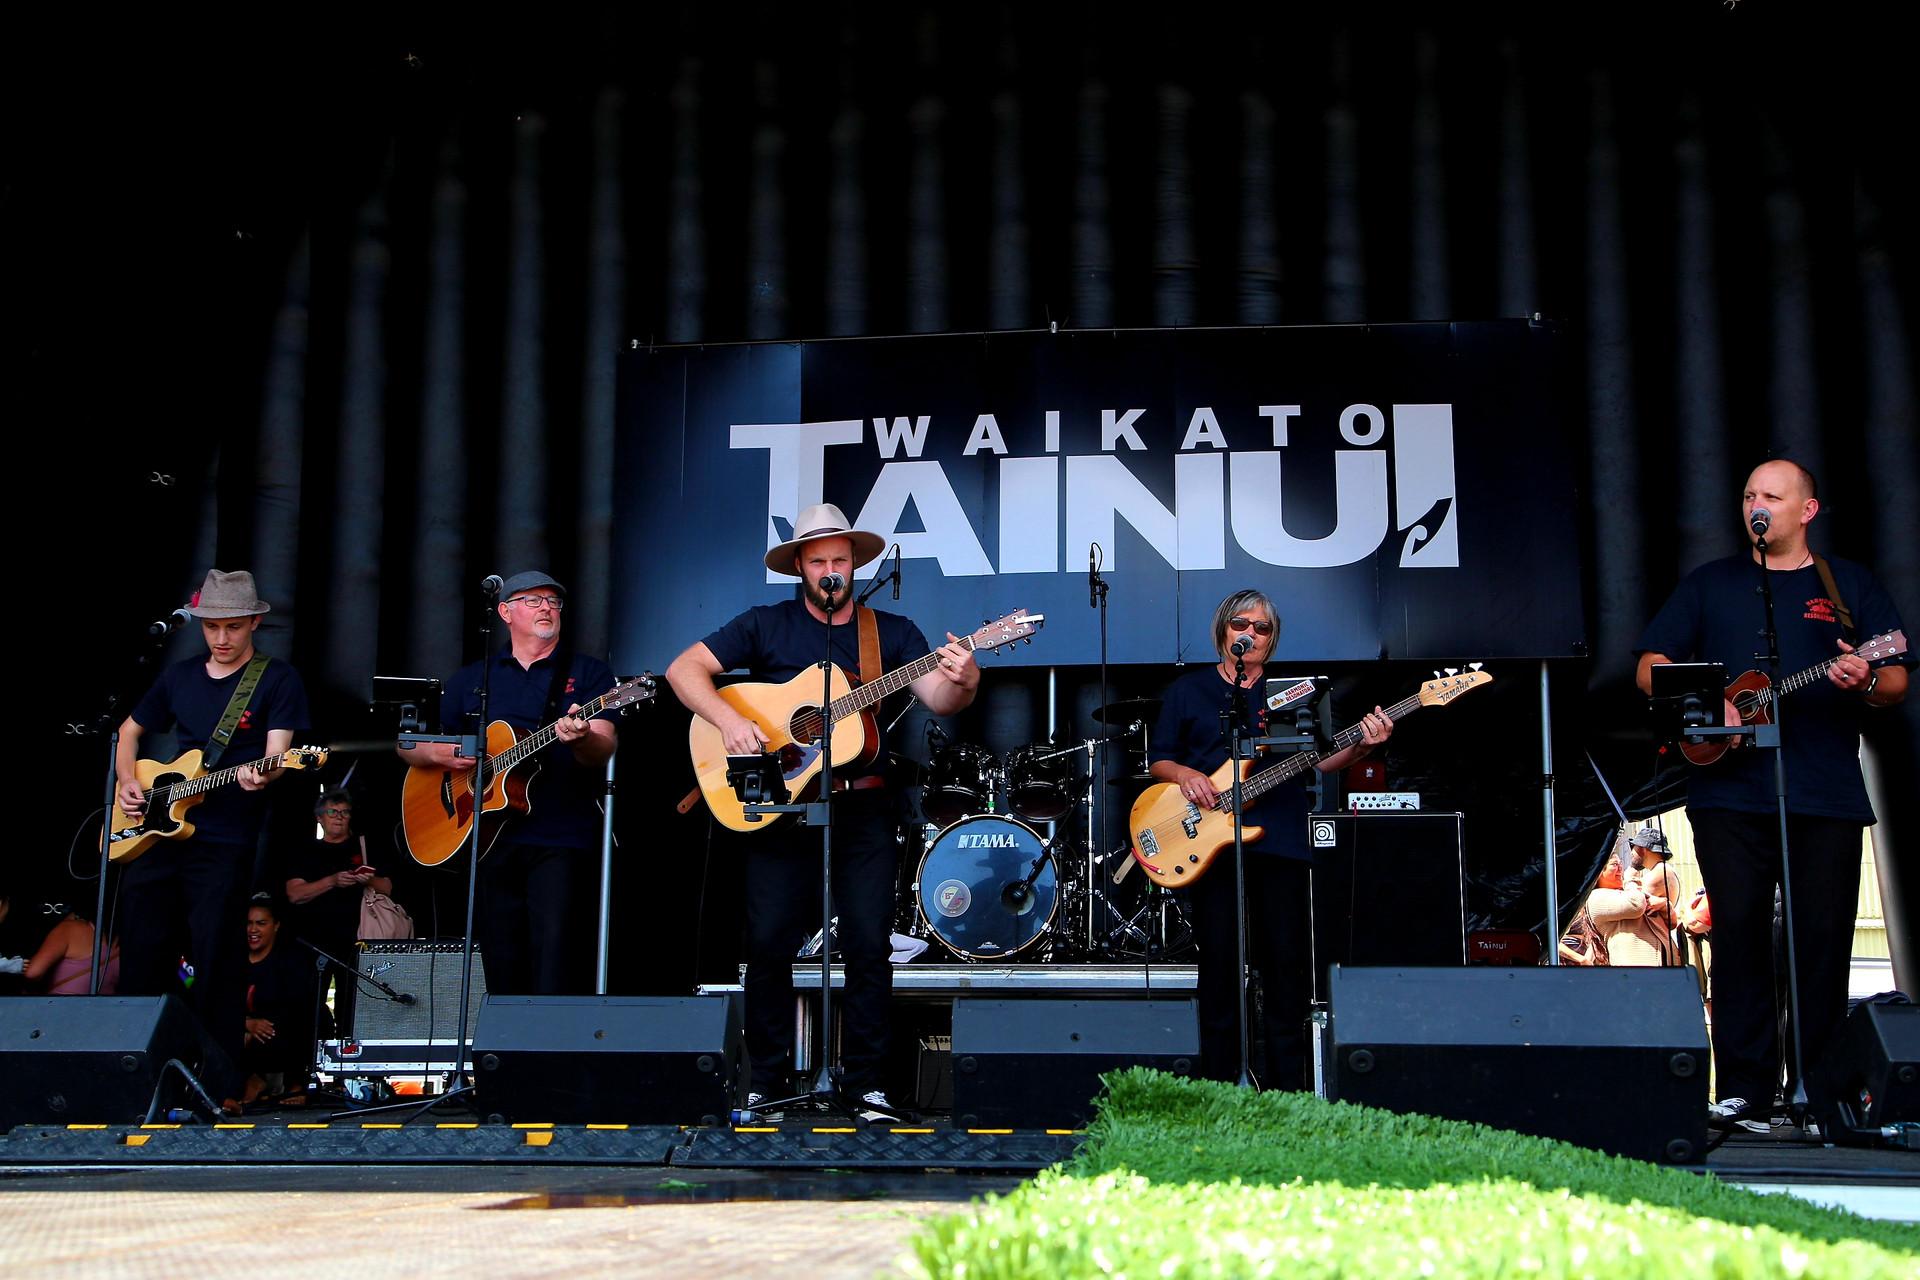 Tainui Games